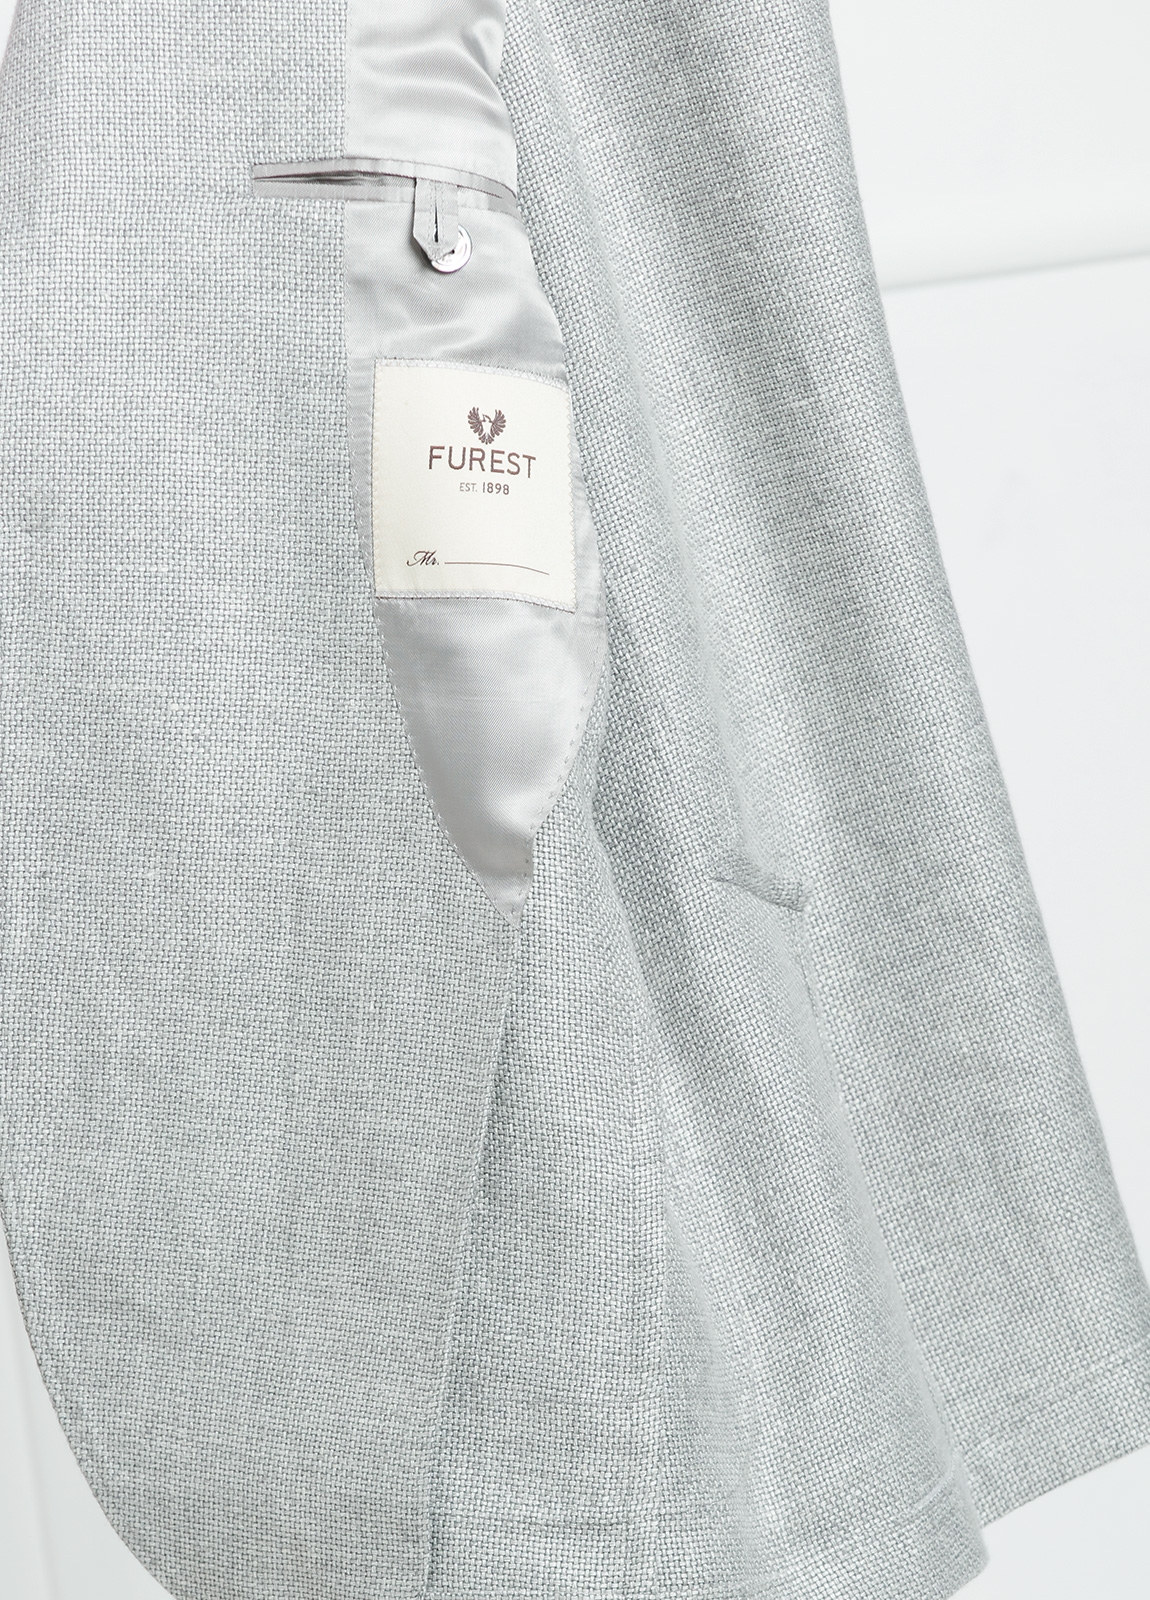 Americana SOFT JACKET Slim Fit textura color gris. 75% Cáñamo 25% lana. - Ítem3